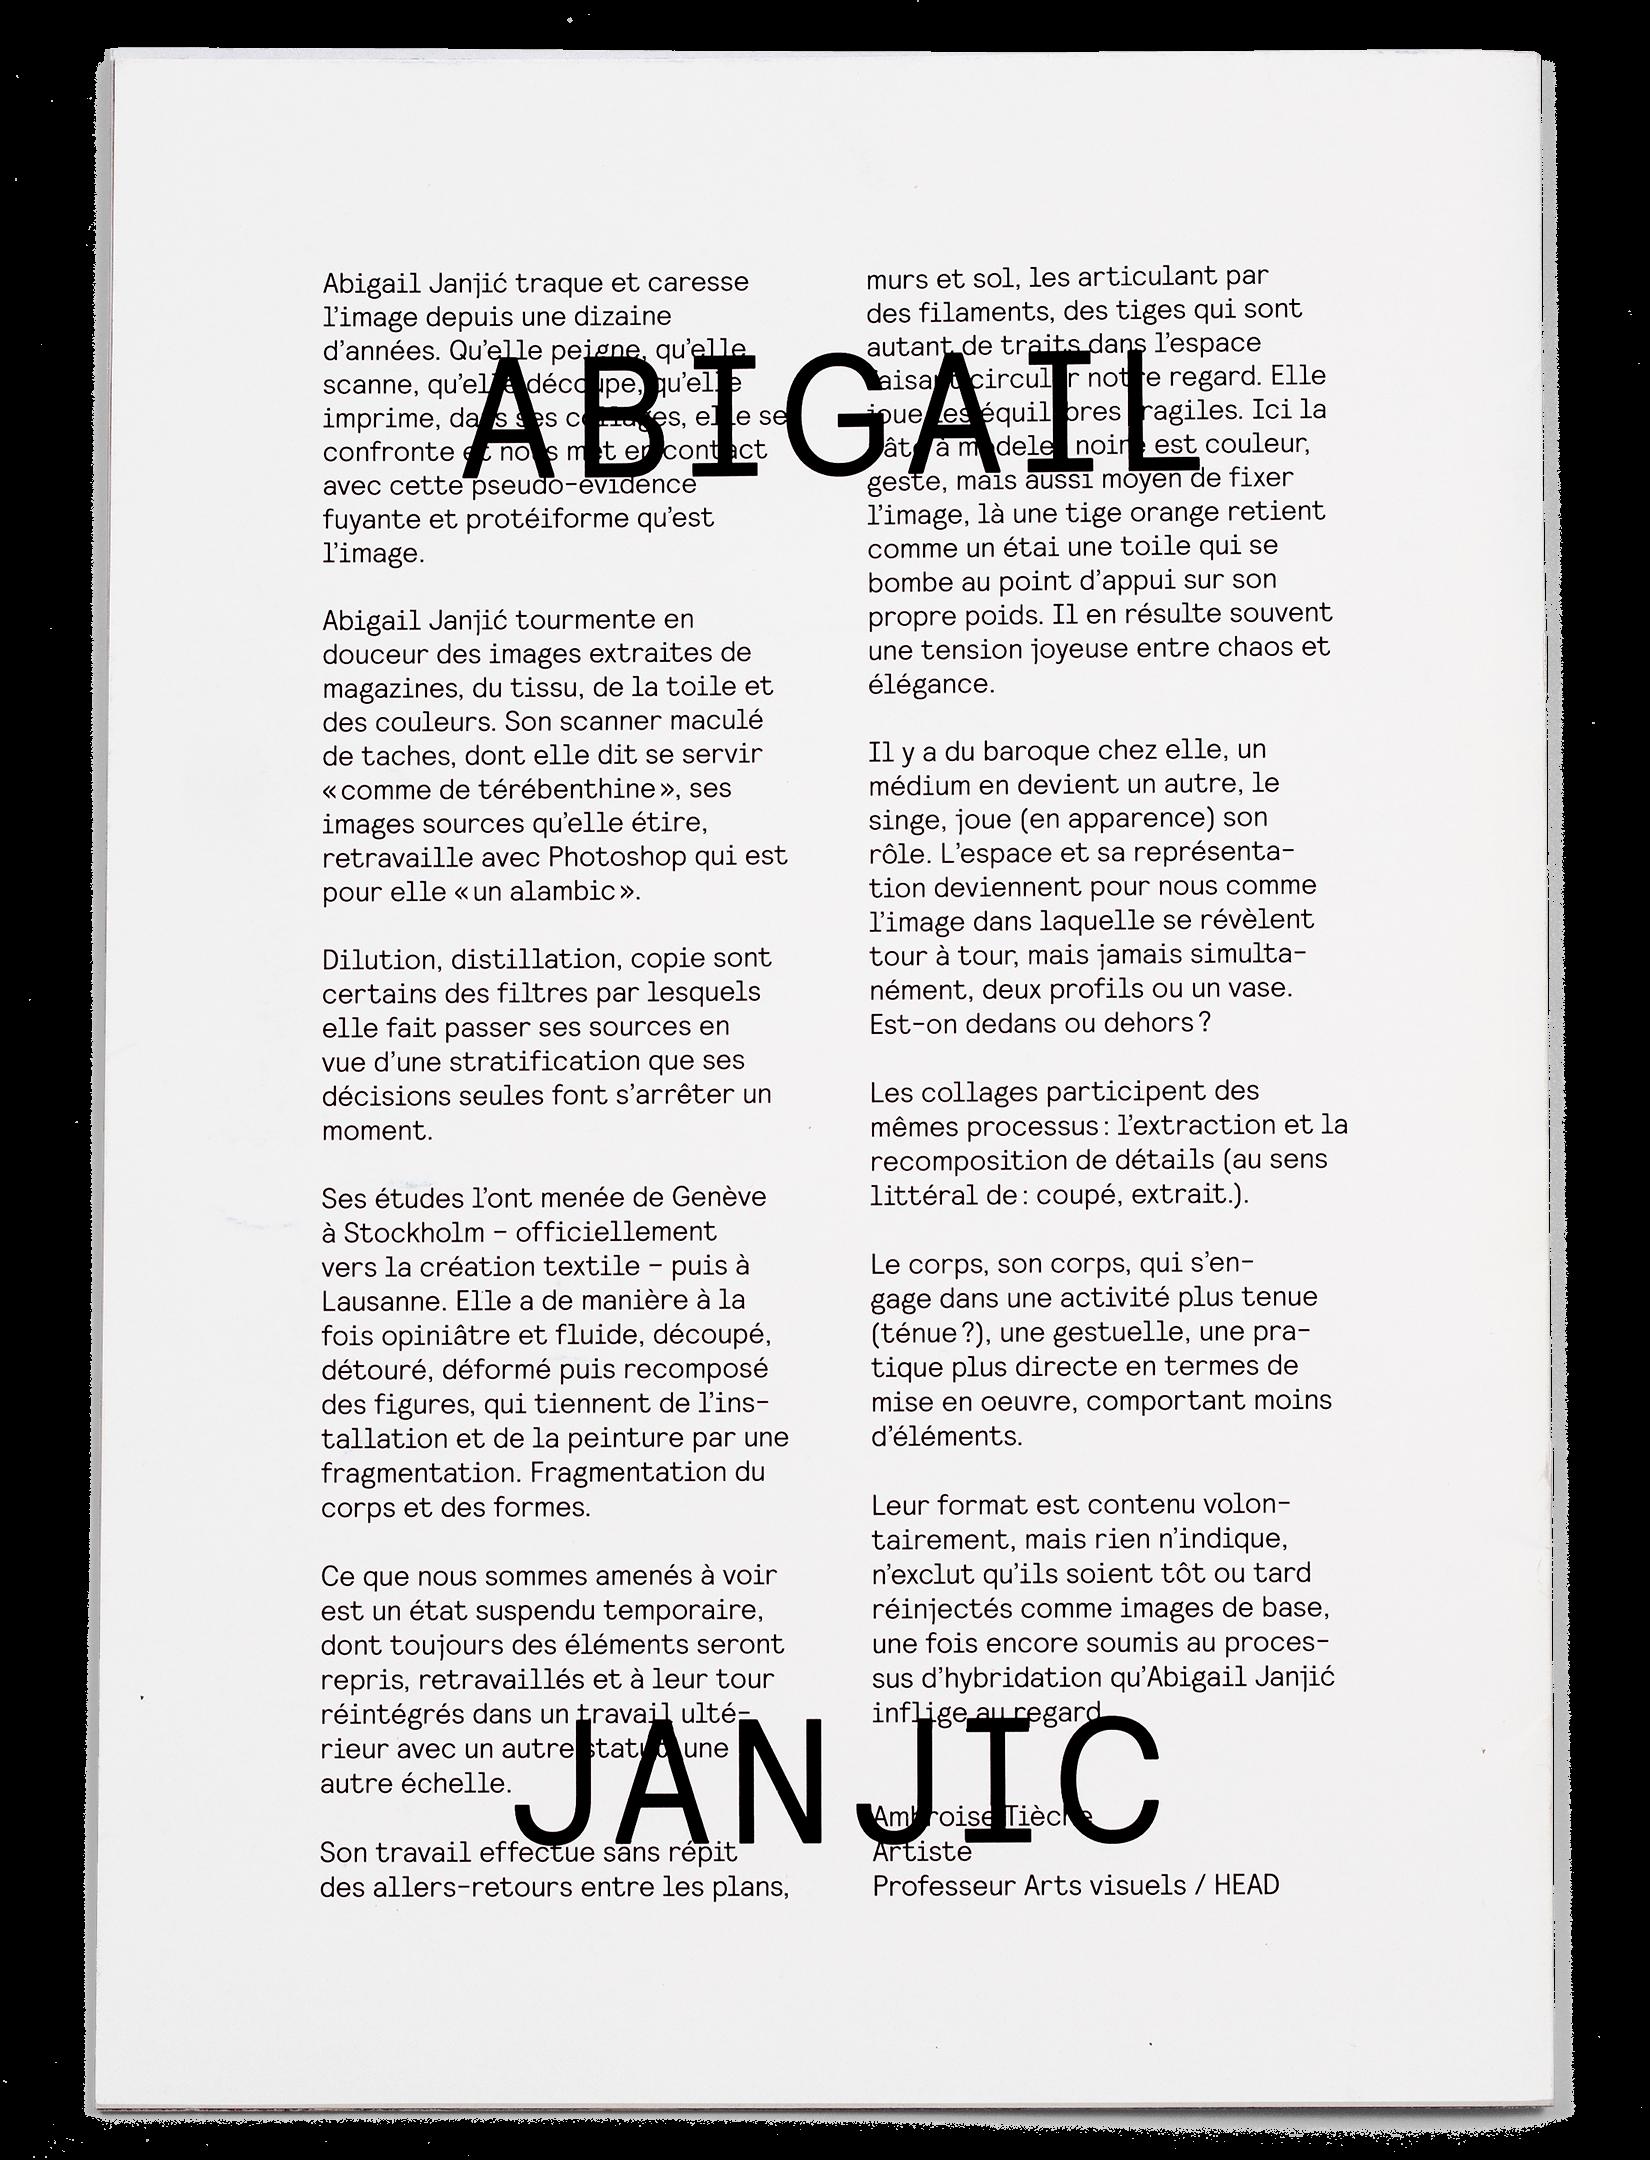 Dos du portfolio de l'artiste Abigail Janjic